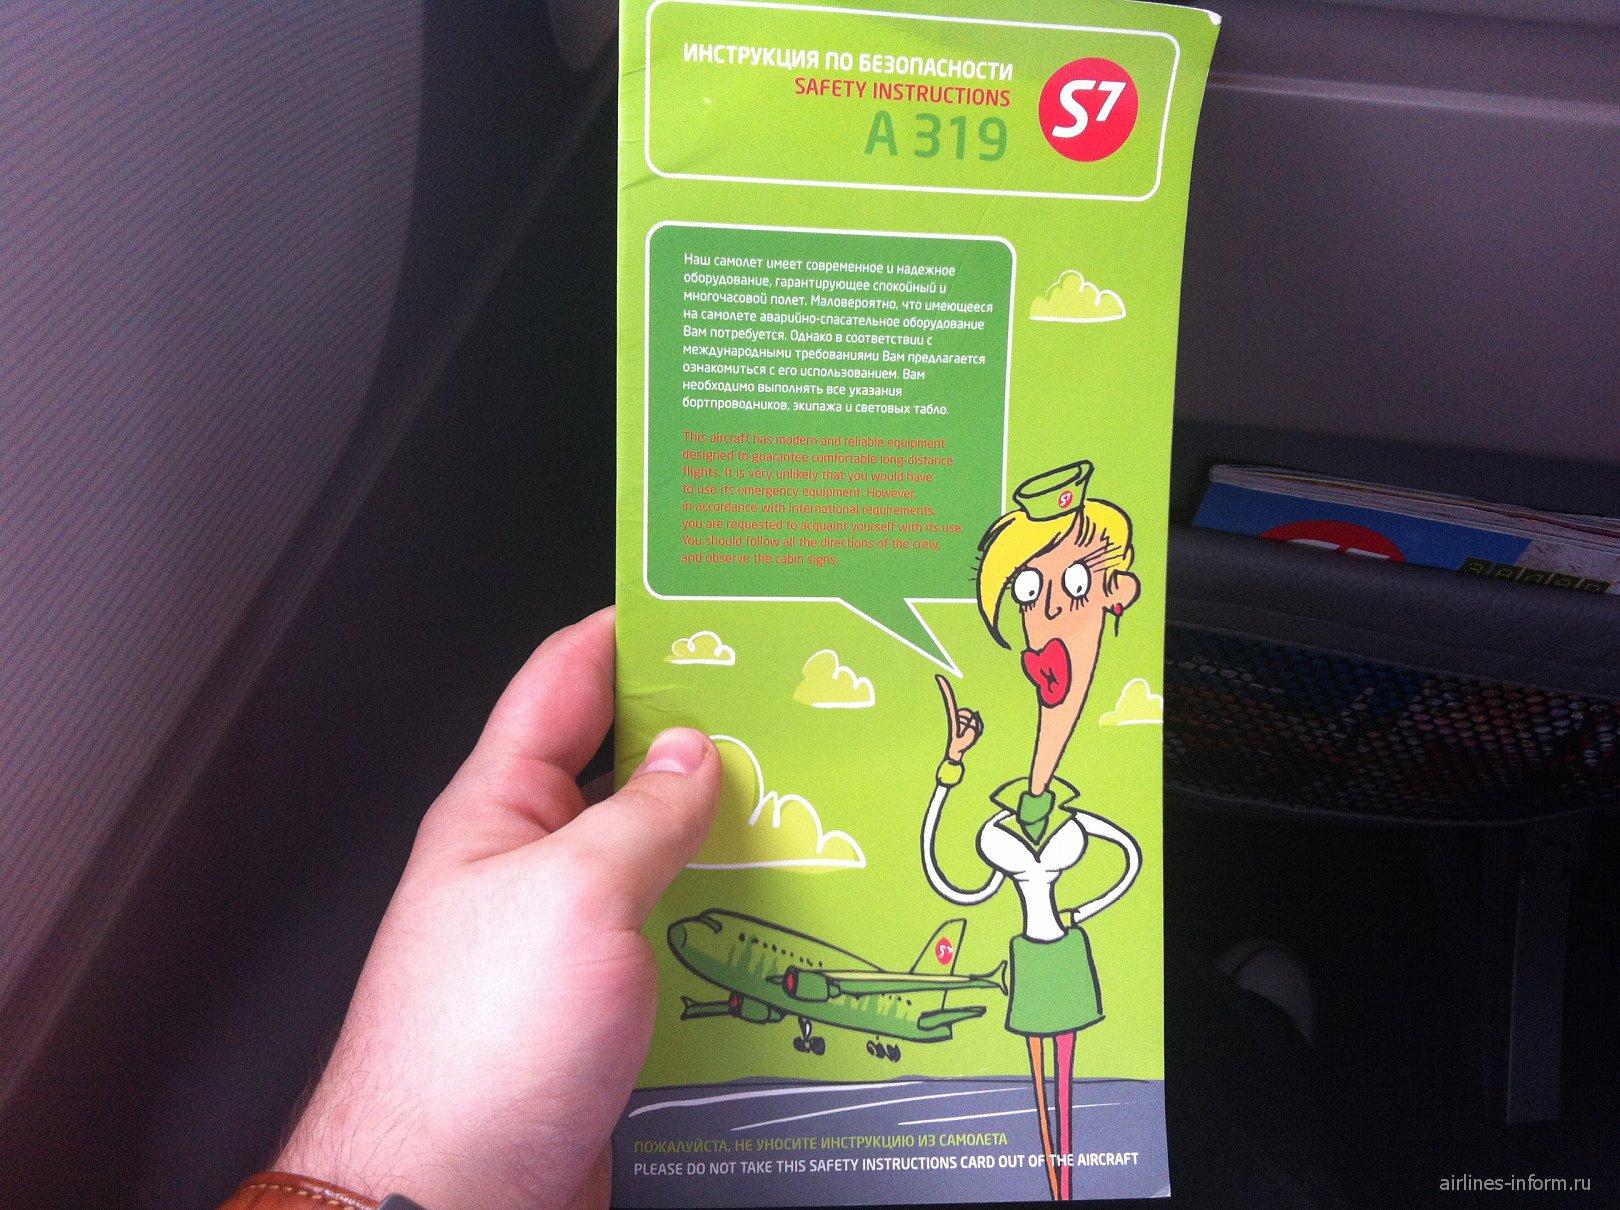 Инструкция по безопасности в самолете Airbus A319 авиакомпании S7 Airlines